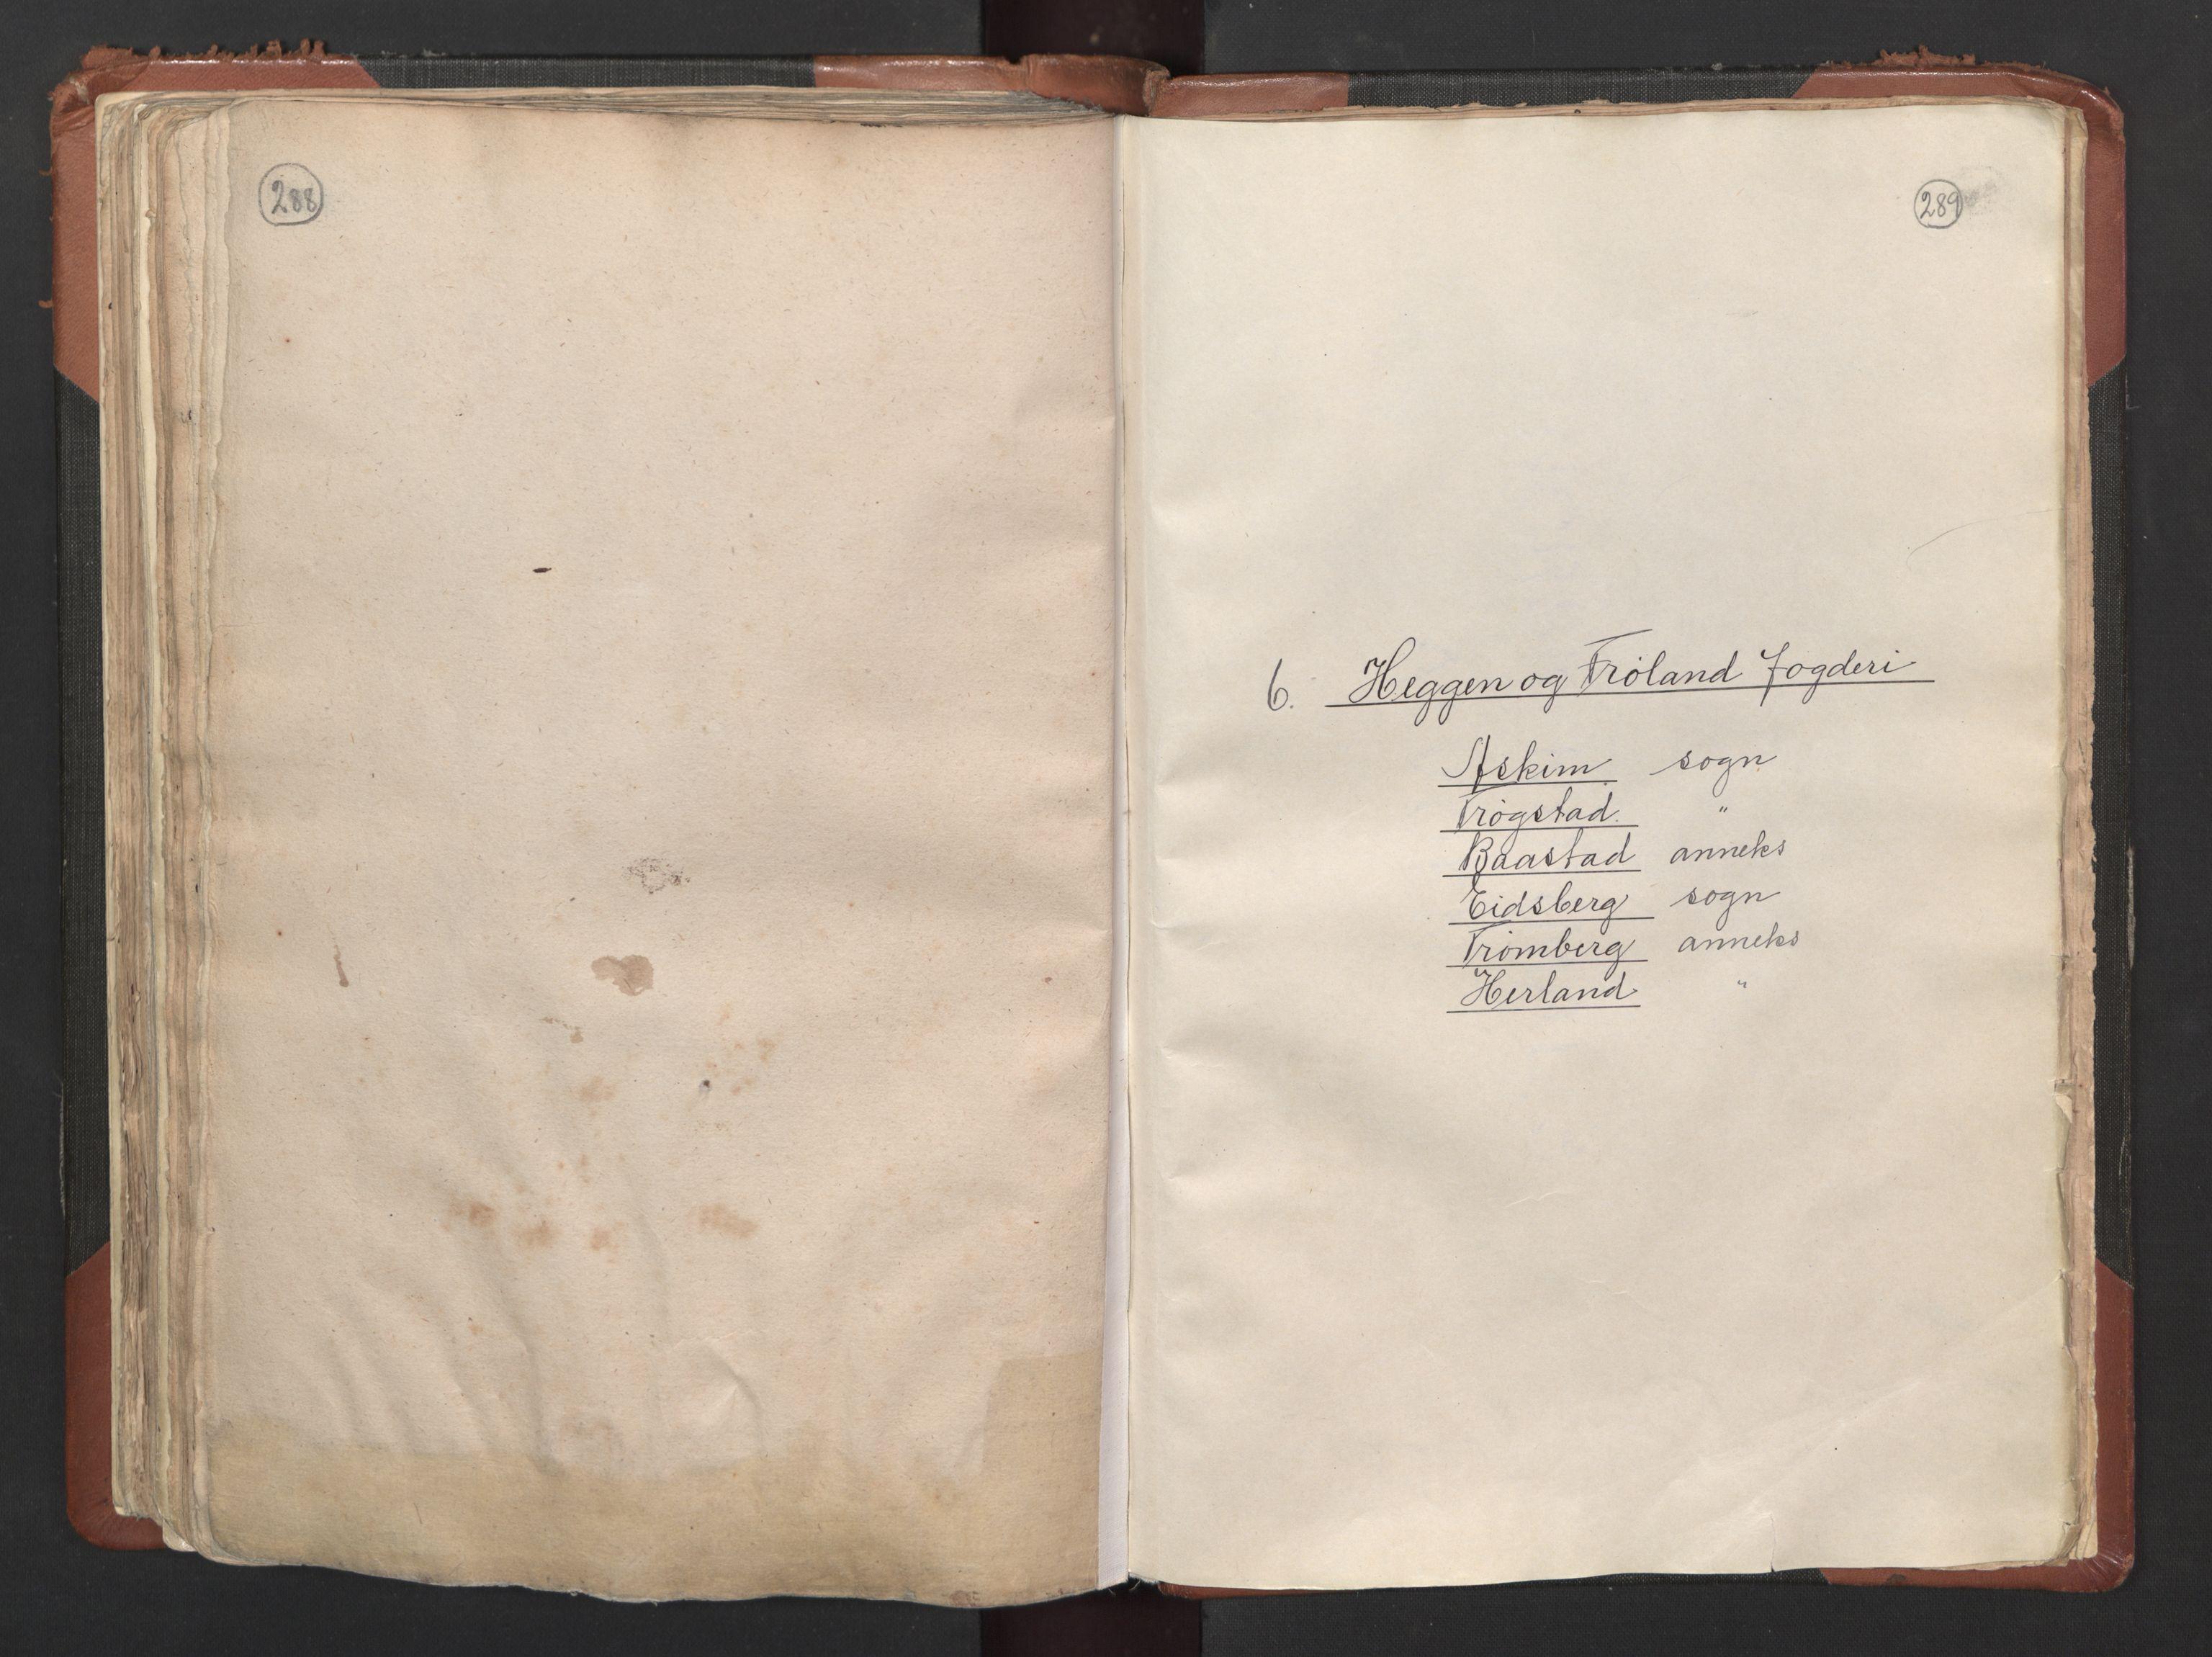 RA, Fogdenes og sorenskrivernes manntall 1664-1666, nr. 1: Fogderier (len og skipreider) i nåværende Østfold fylke, 1664, s. 288-289